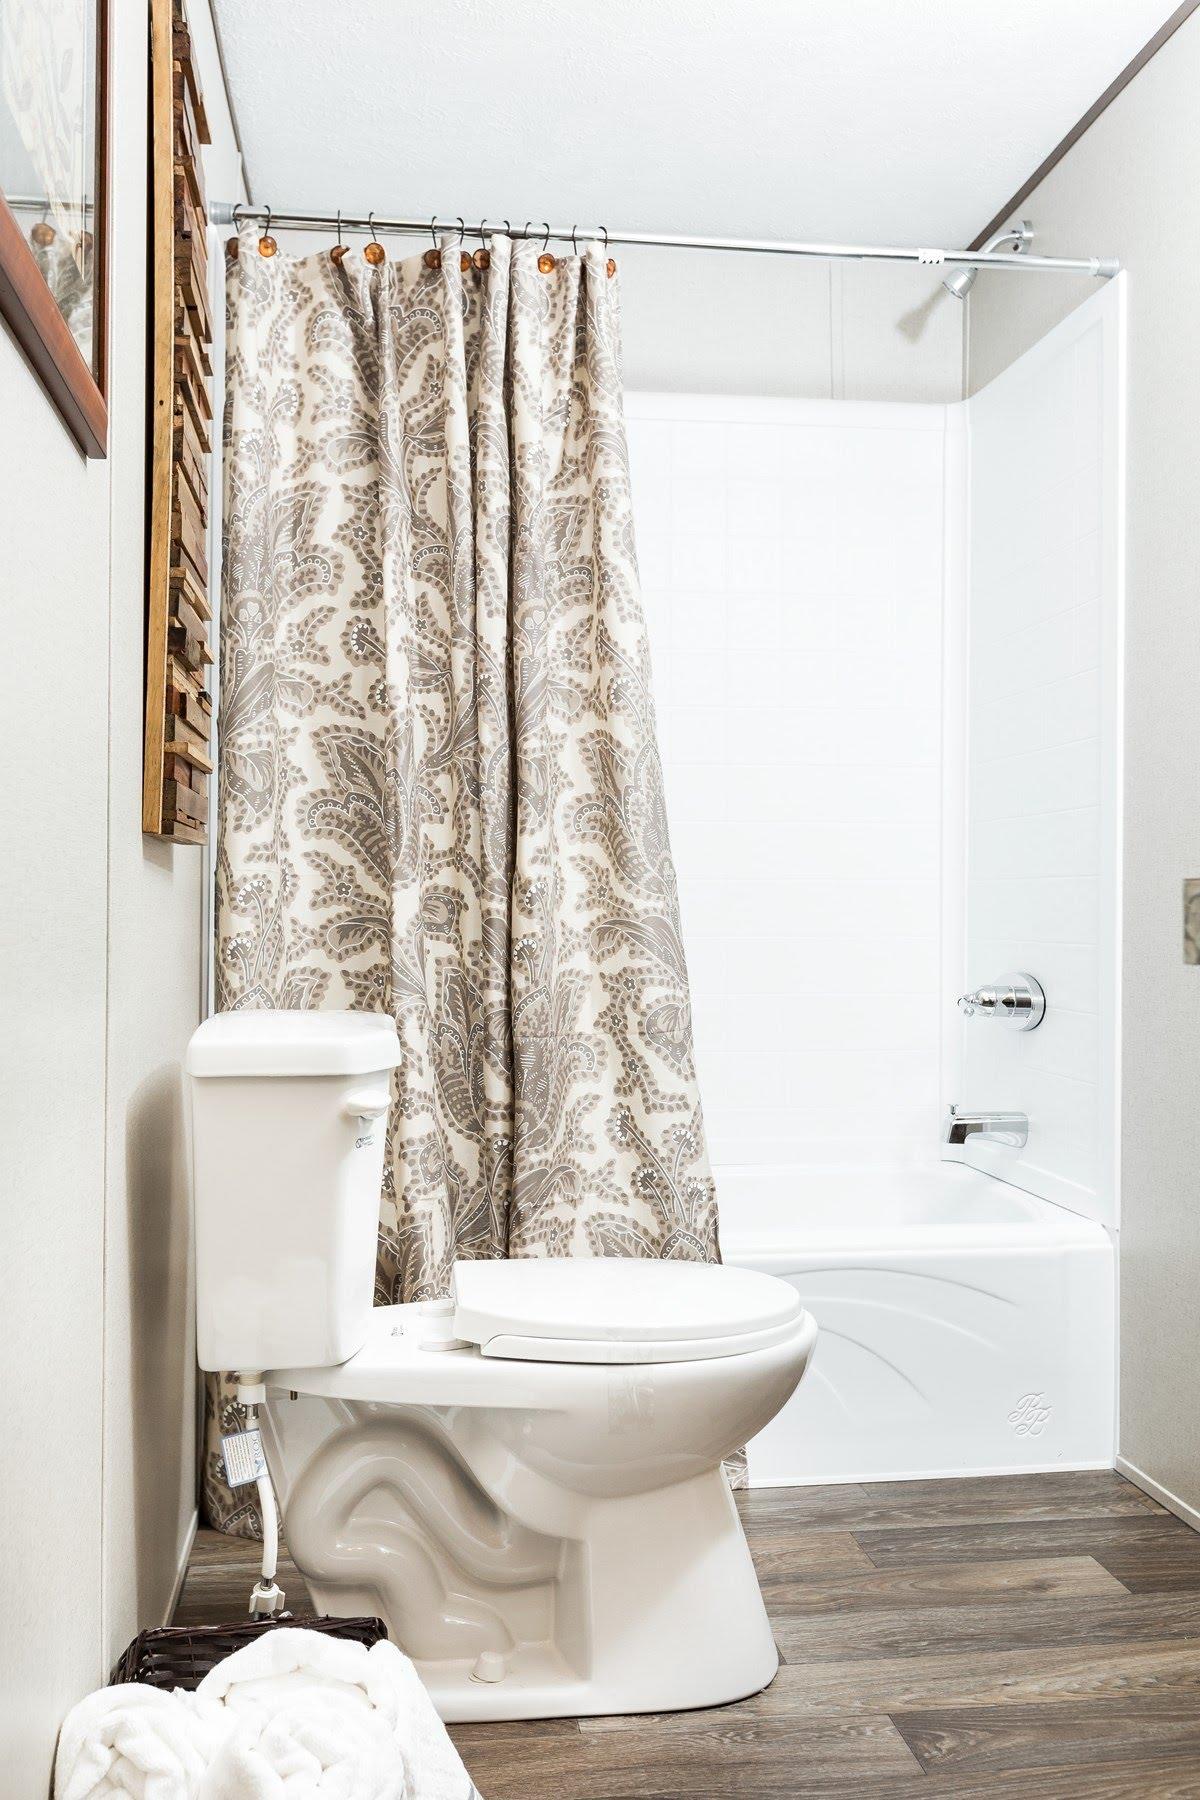 TRU Single Section / Foreman-Exhilaration - Bathroom